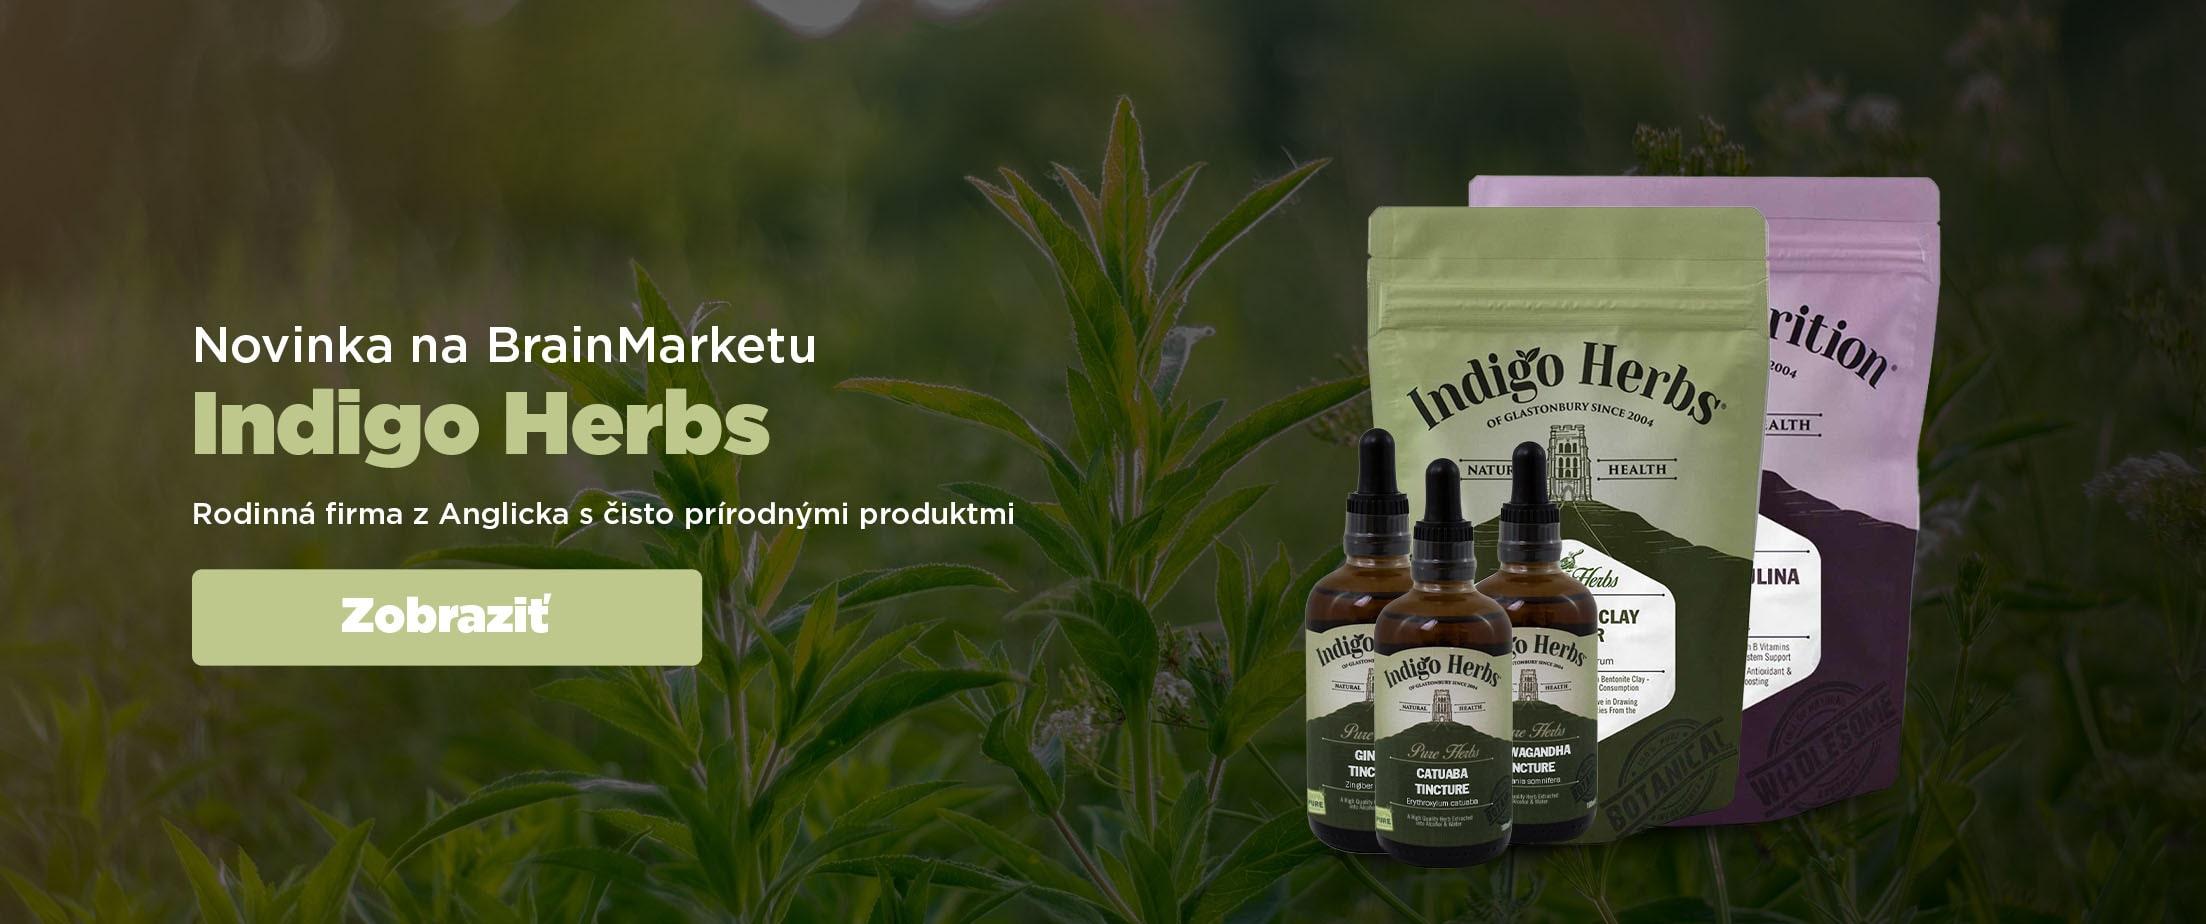 https://www.brainmarket.sk/znacka/indigo-herbs/